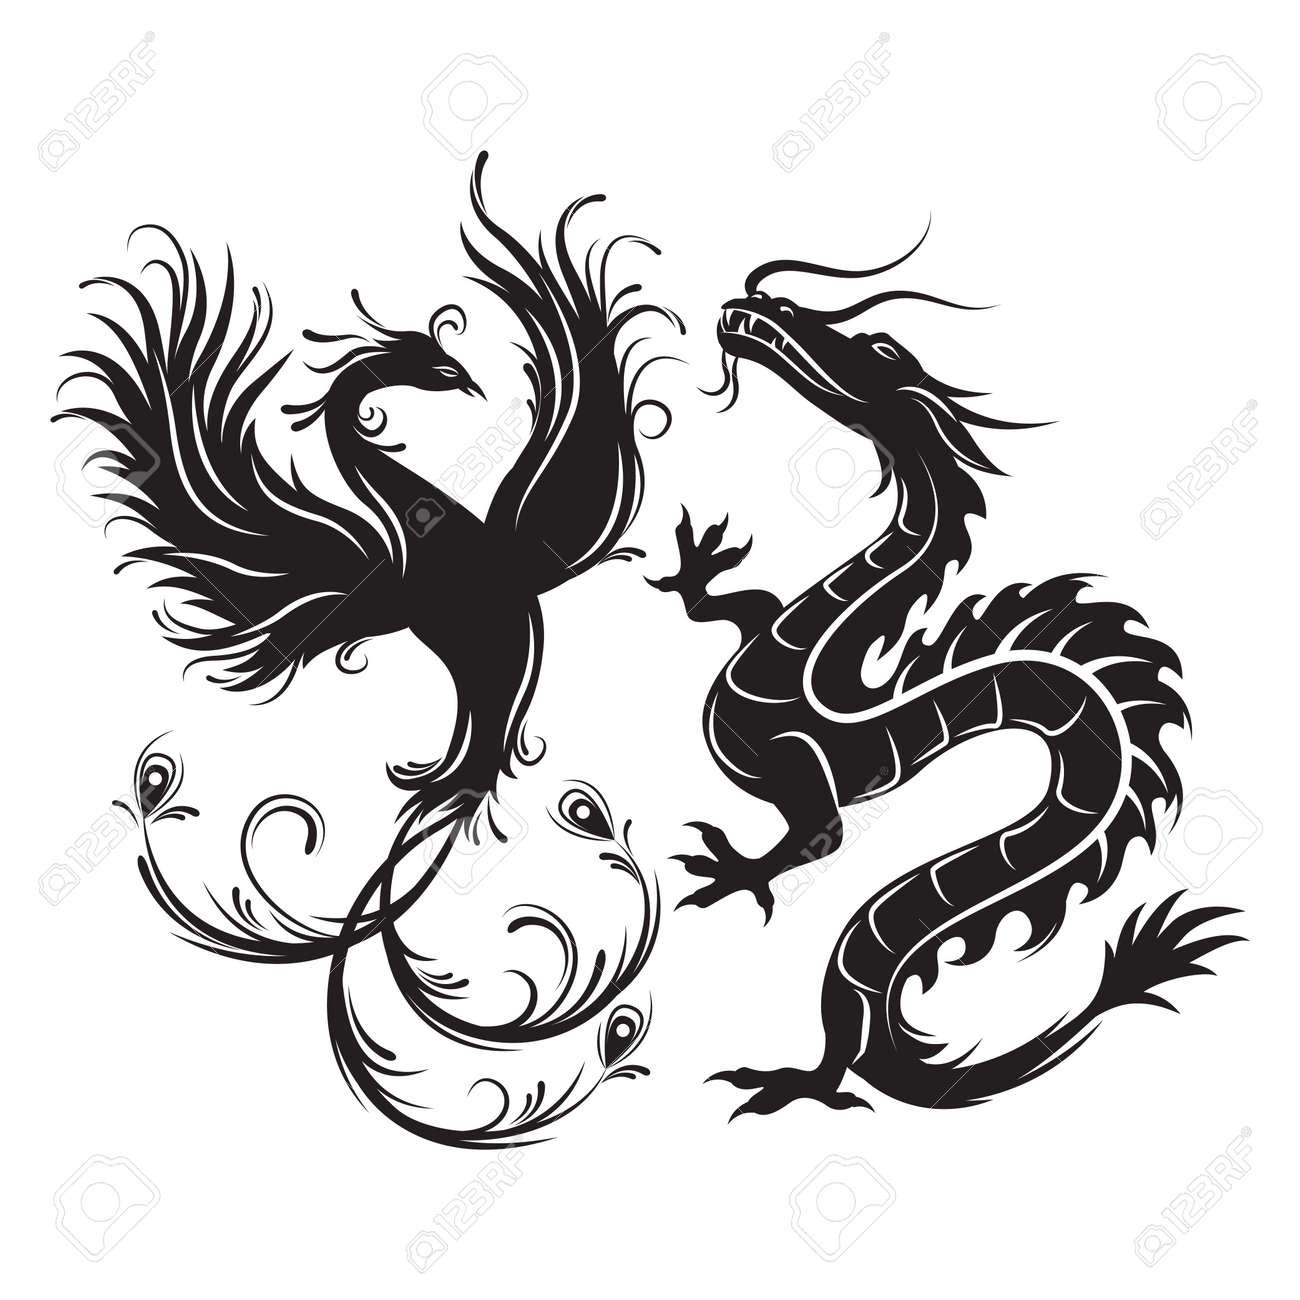 silhouette of phoenix bird and dragon symbol of balance dragon